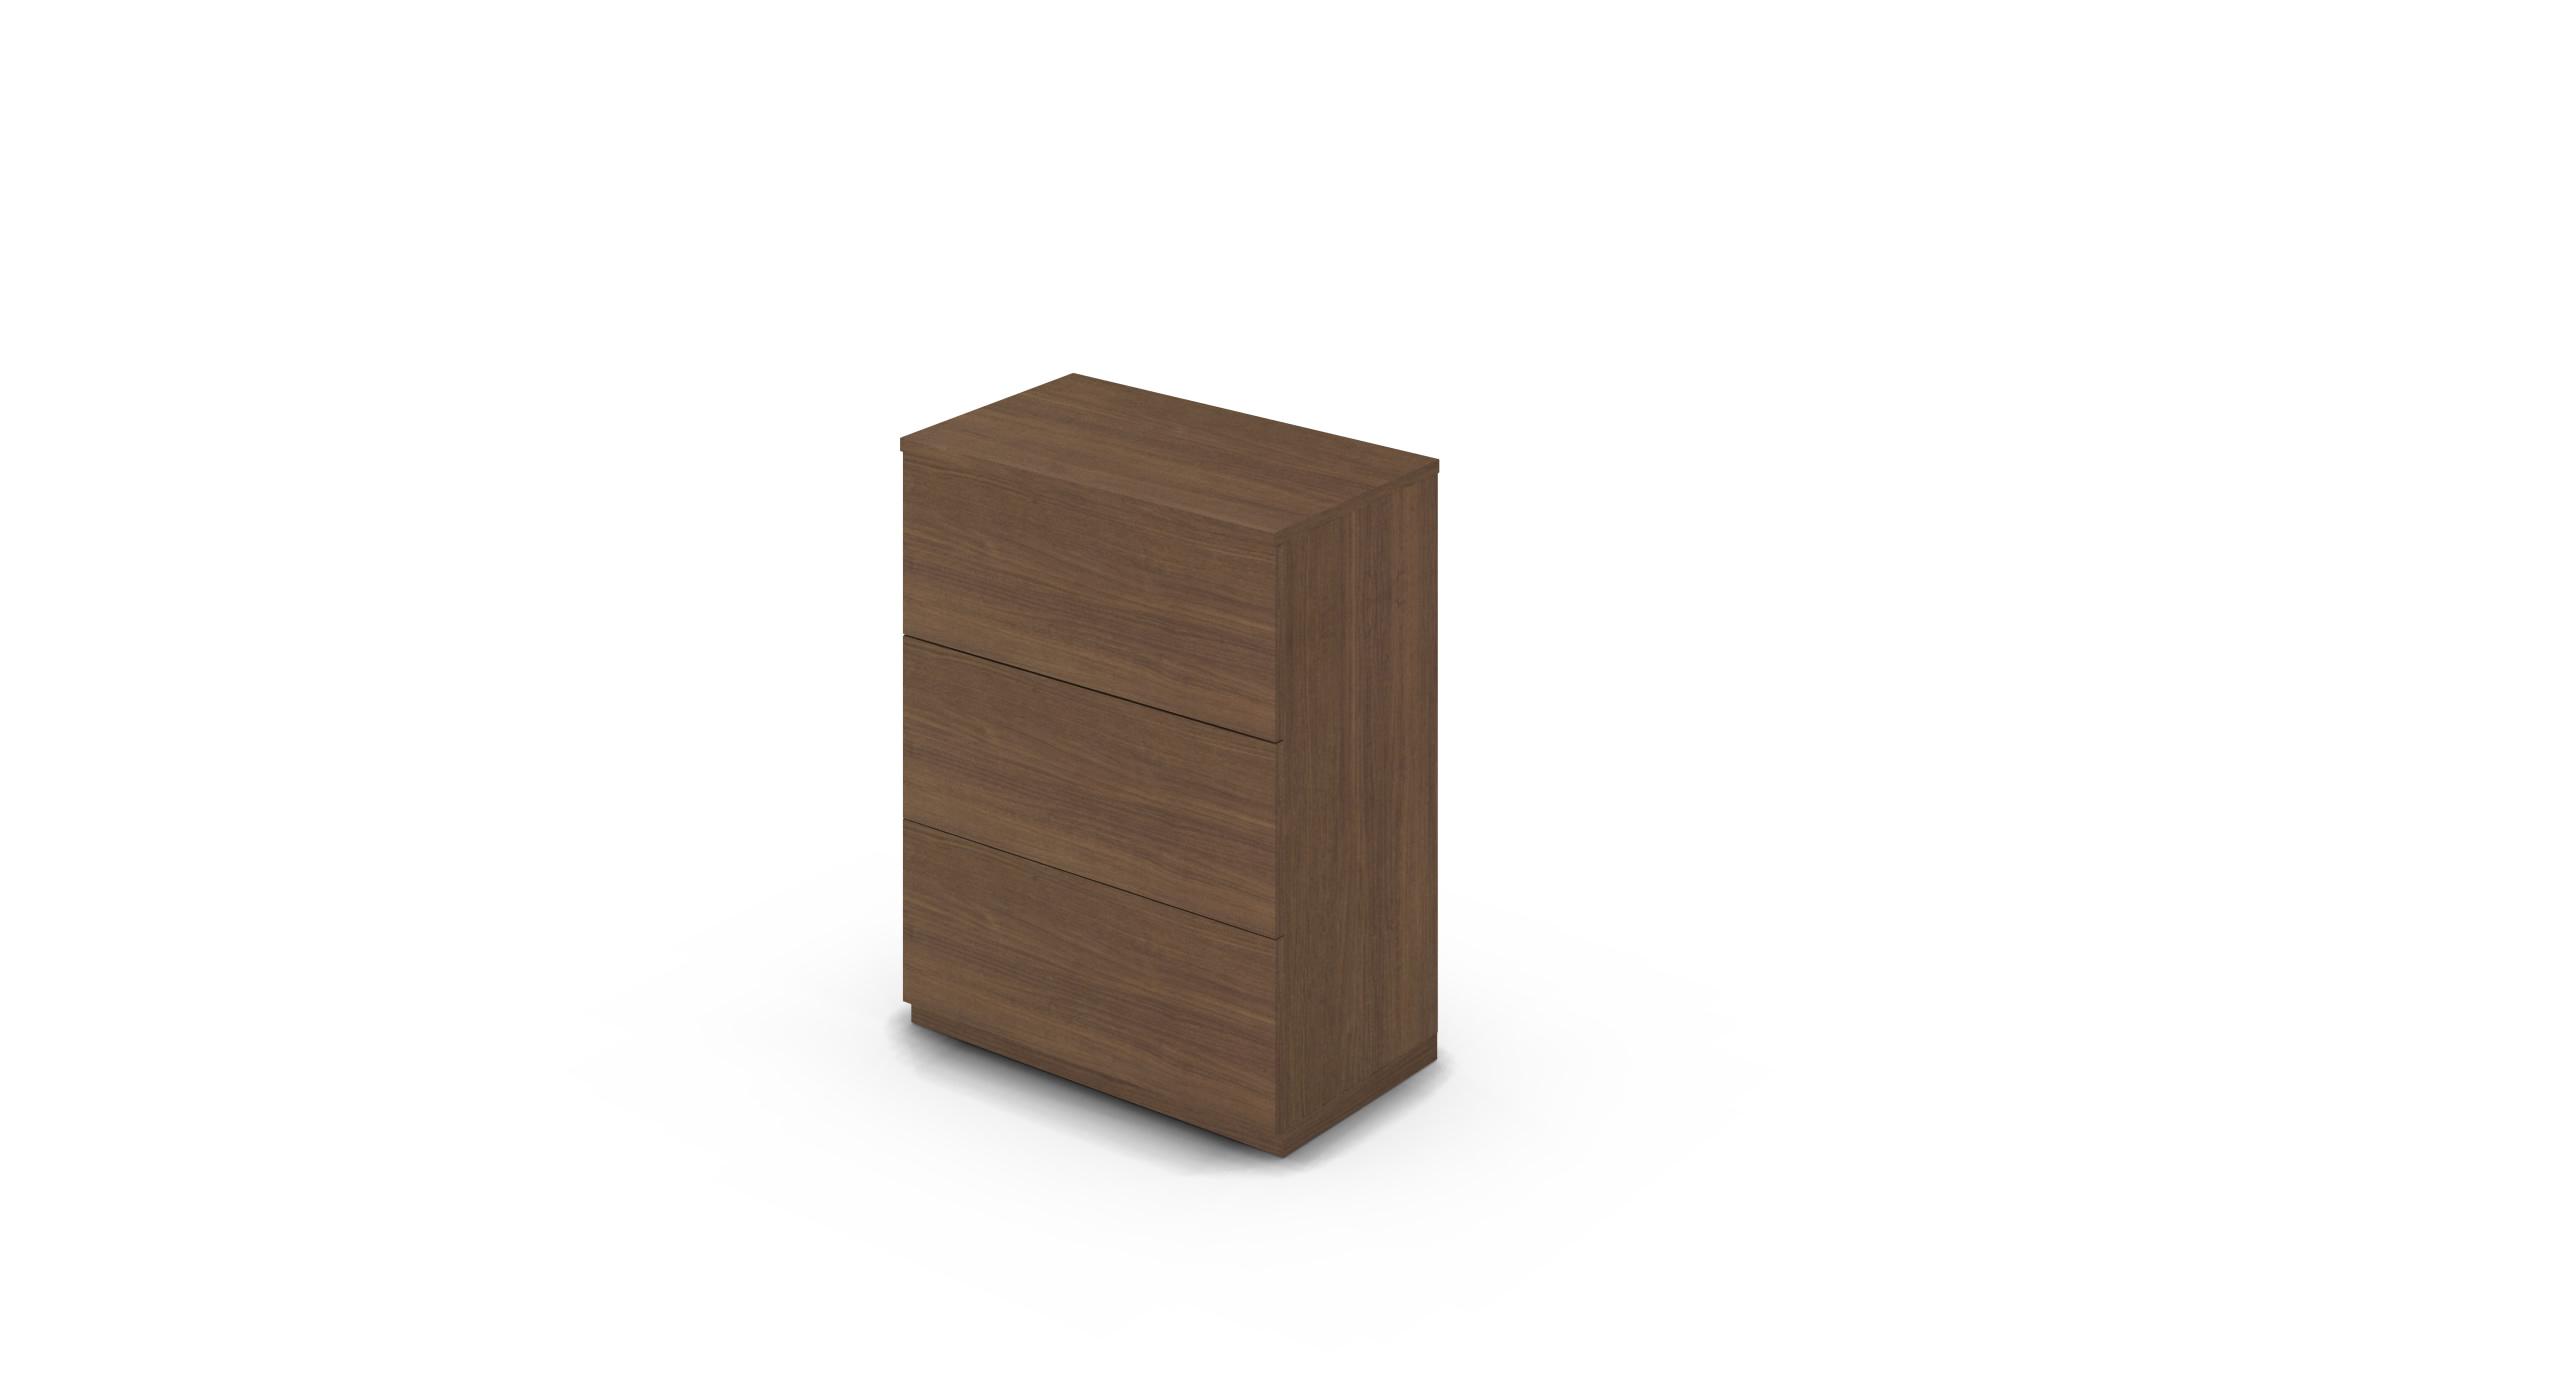 Cabinet_800x450x1125_DR_Walnut_Push_NoCylinder